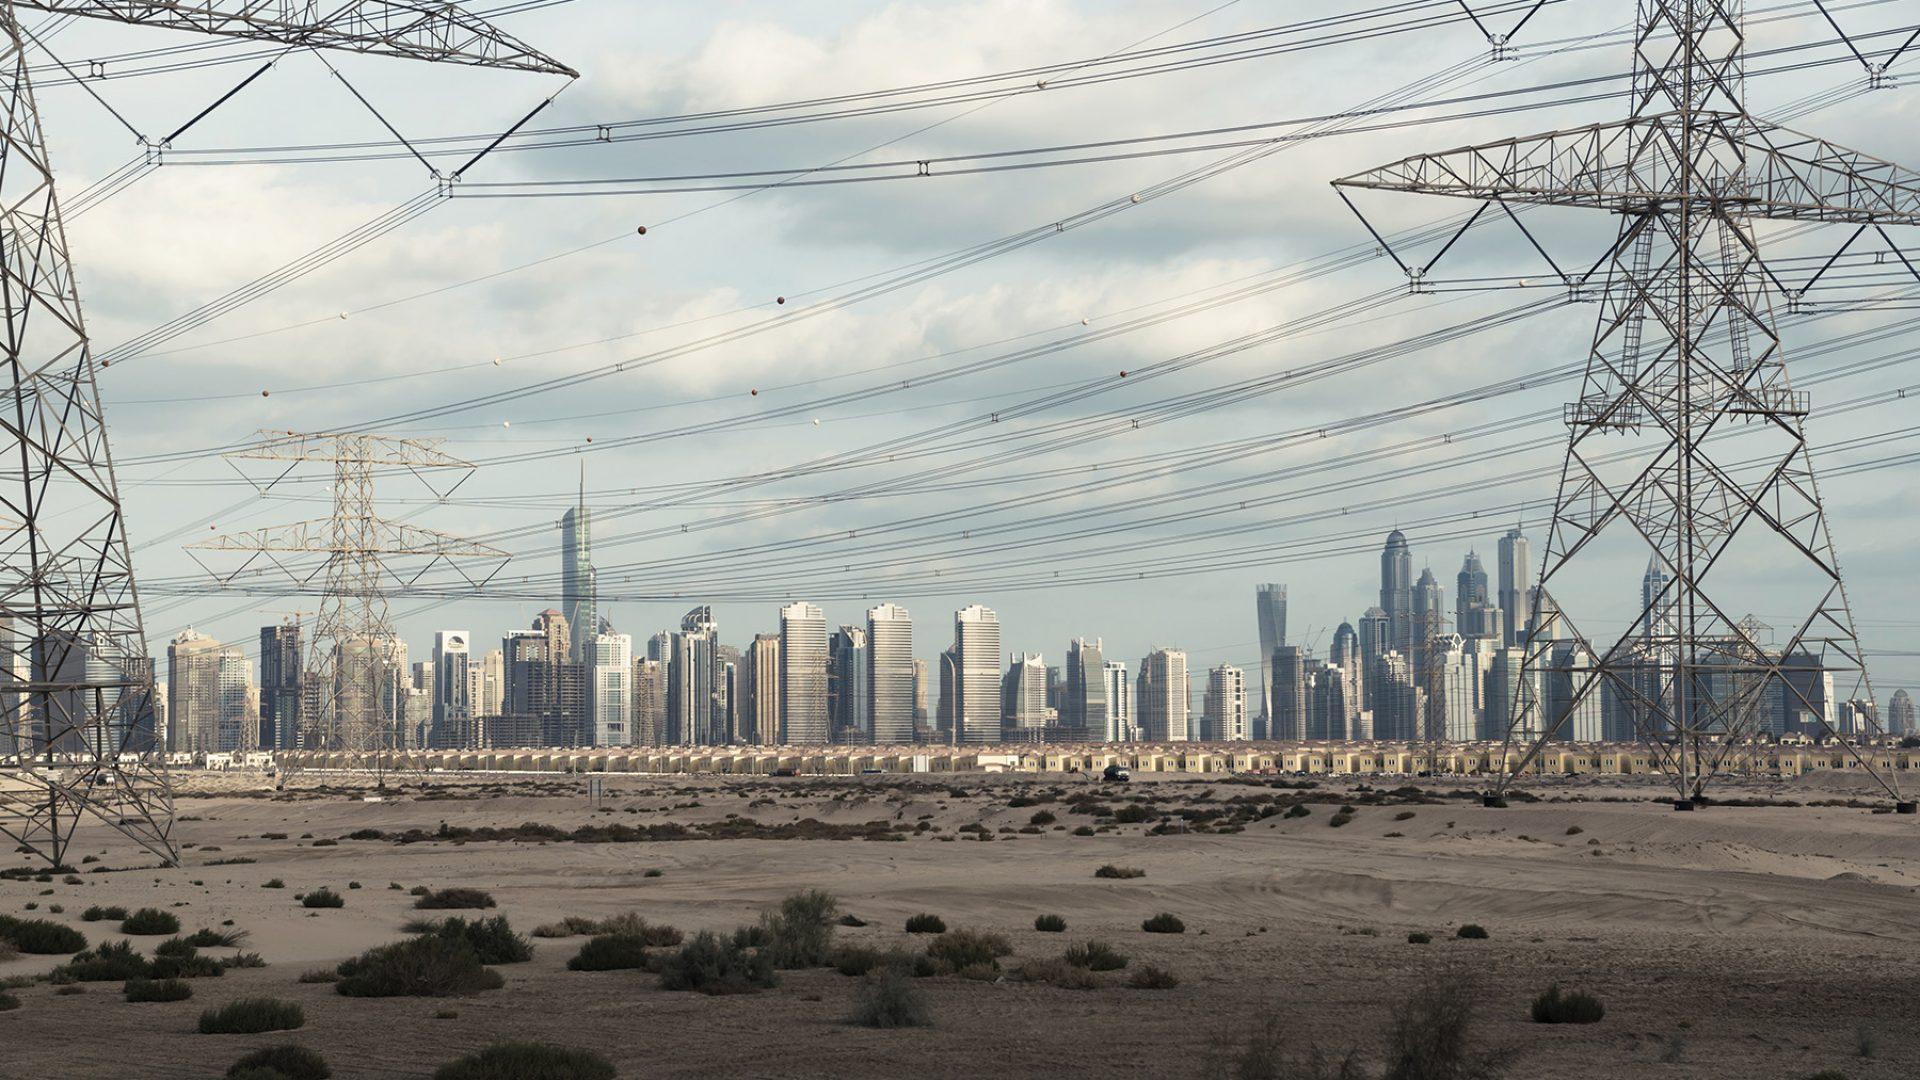 UAE utilities